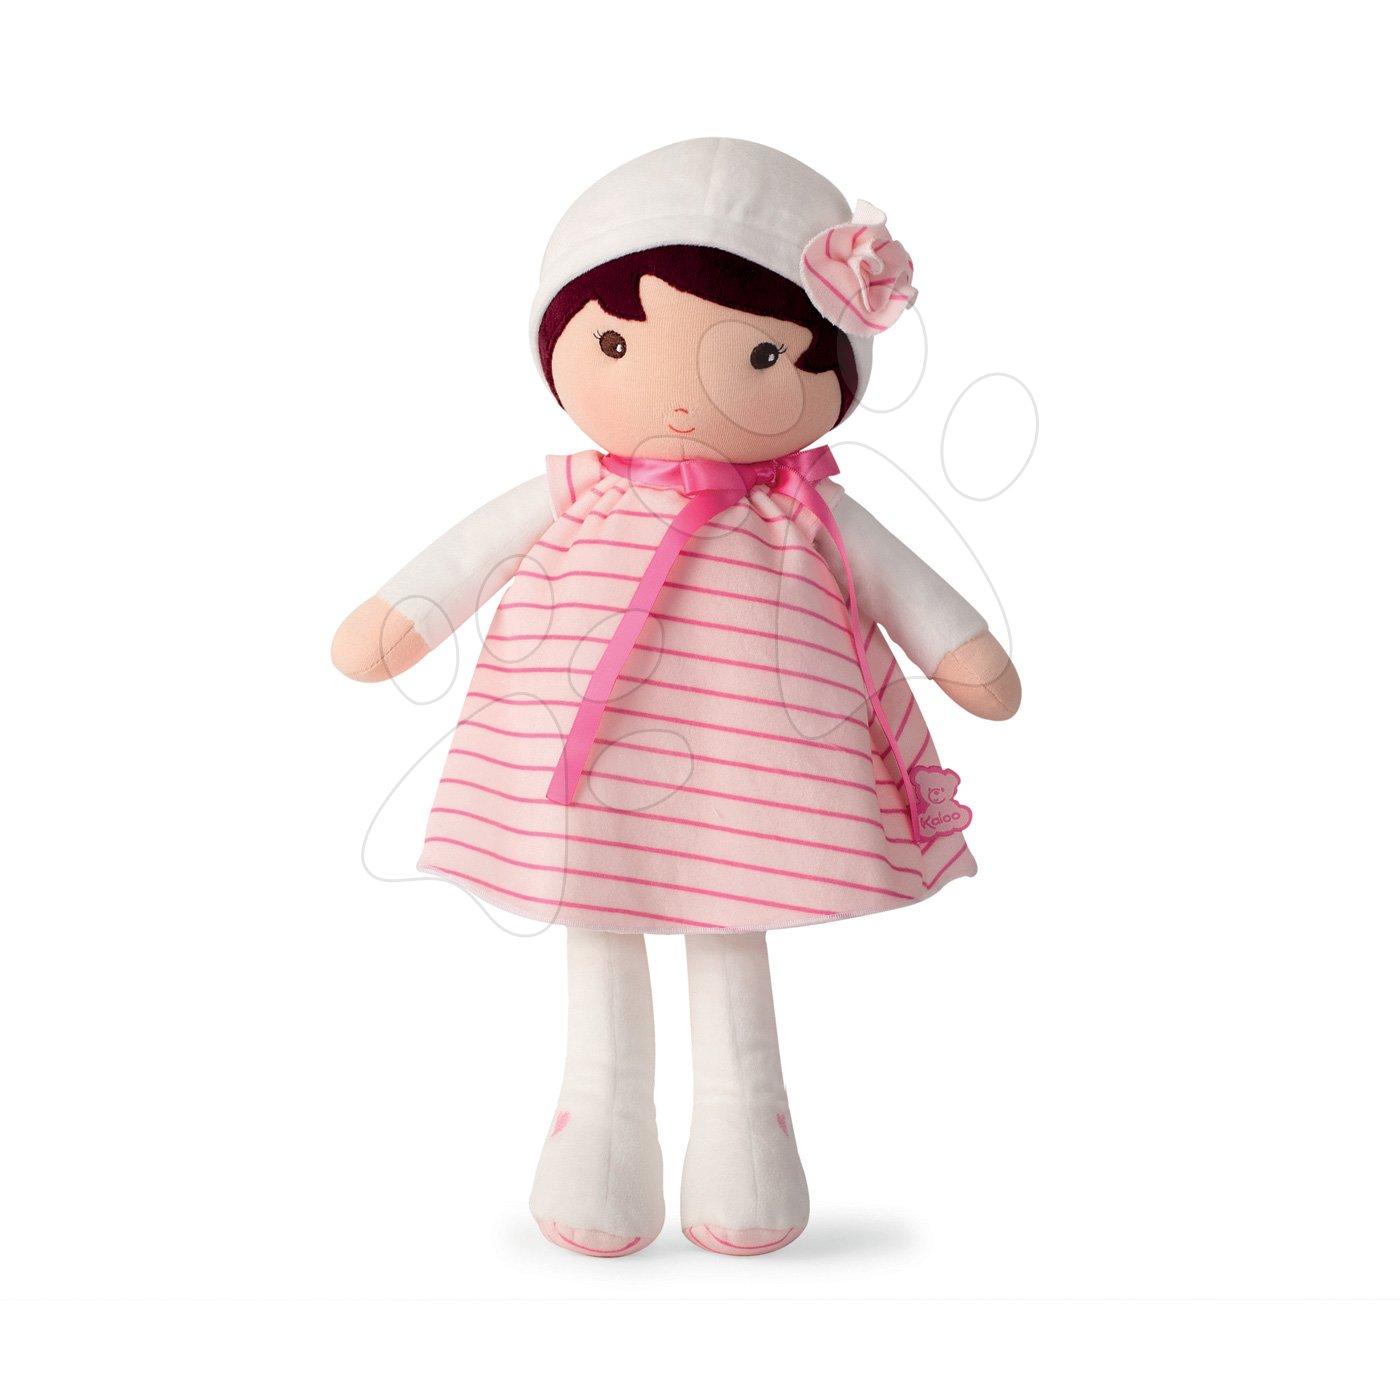 Kaloo bábika pre bábätká Rose K Tendresse 40 cm v pásikavých šatách z jemného textilu v darčekovom balení 962088